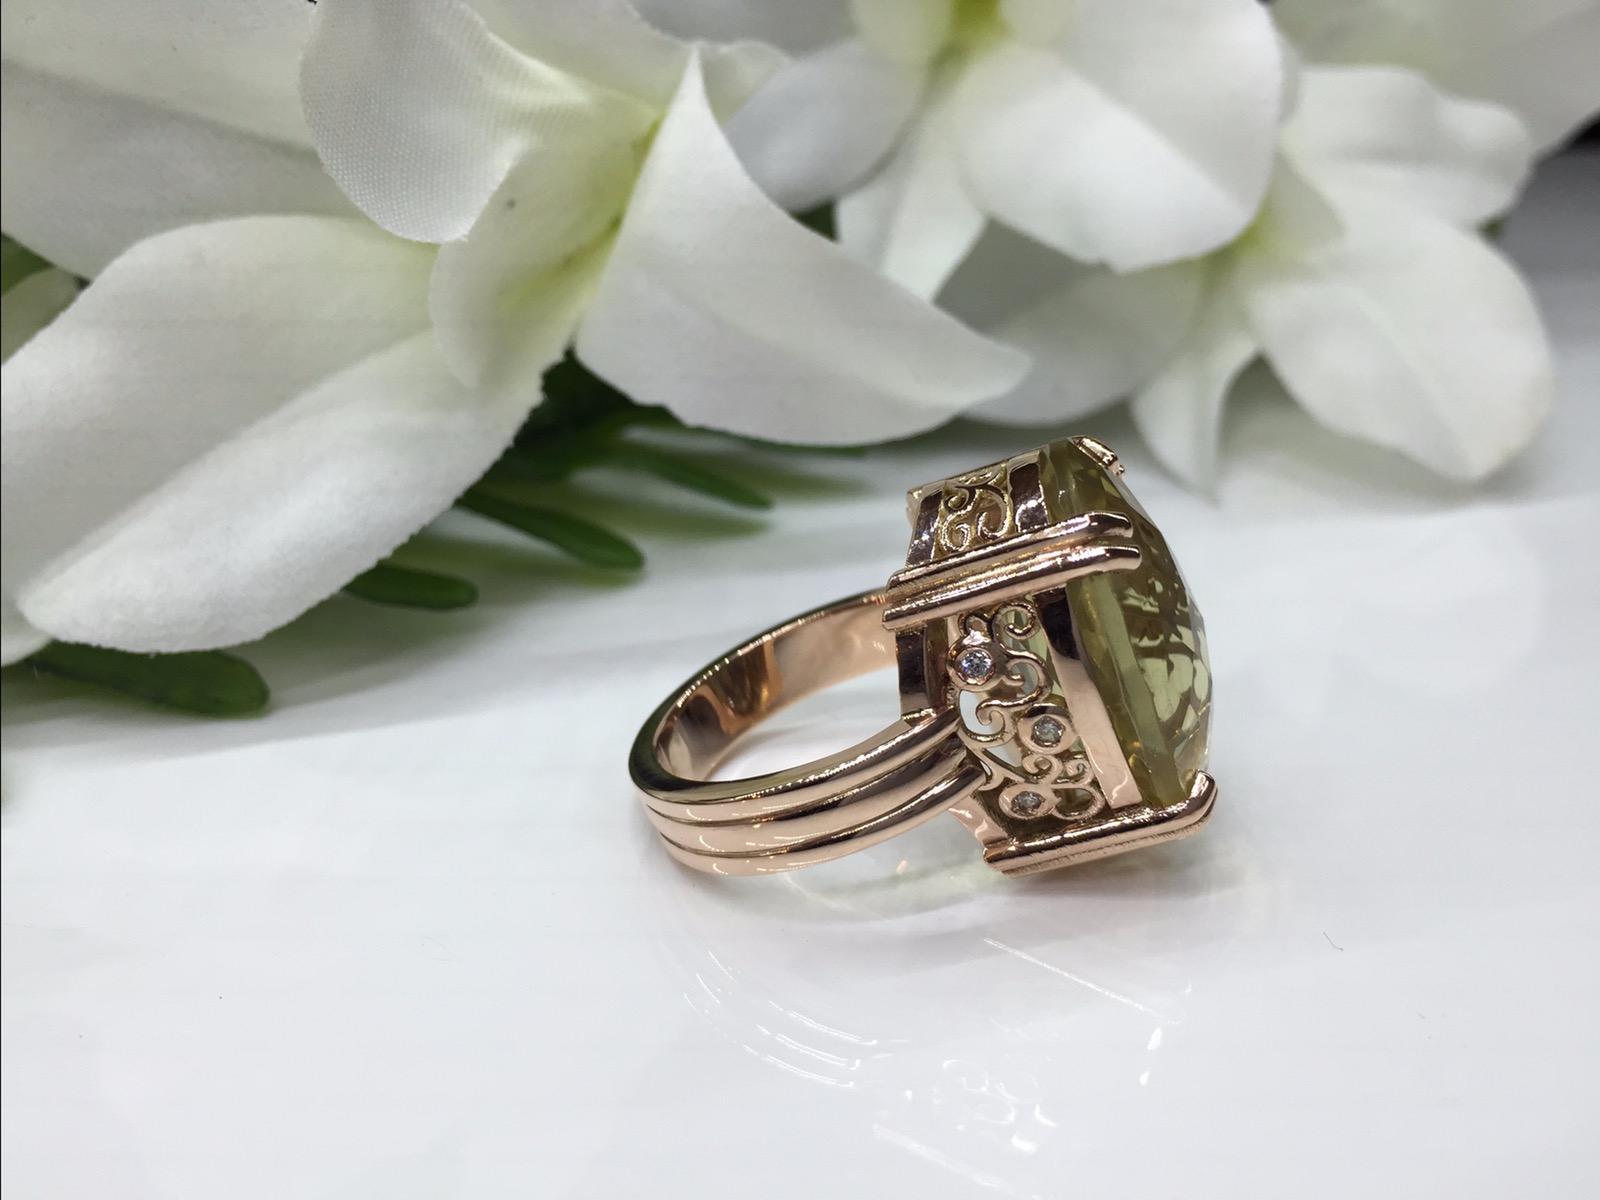 Rose Gold Diamonds and Lemon Quartz Ring On Display Now